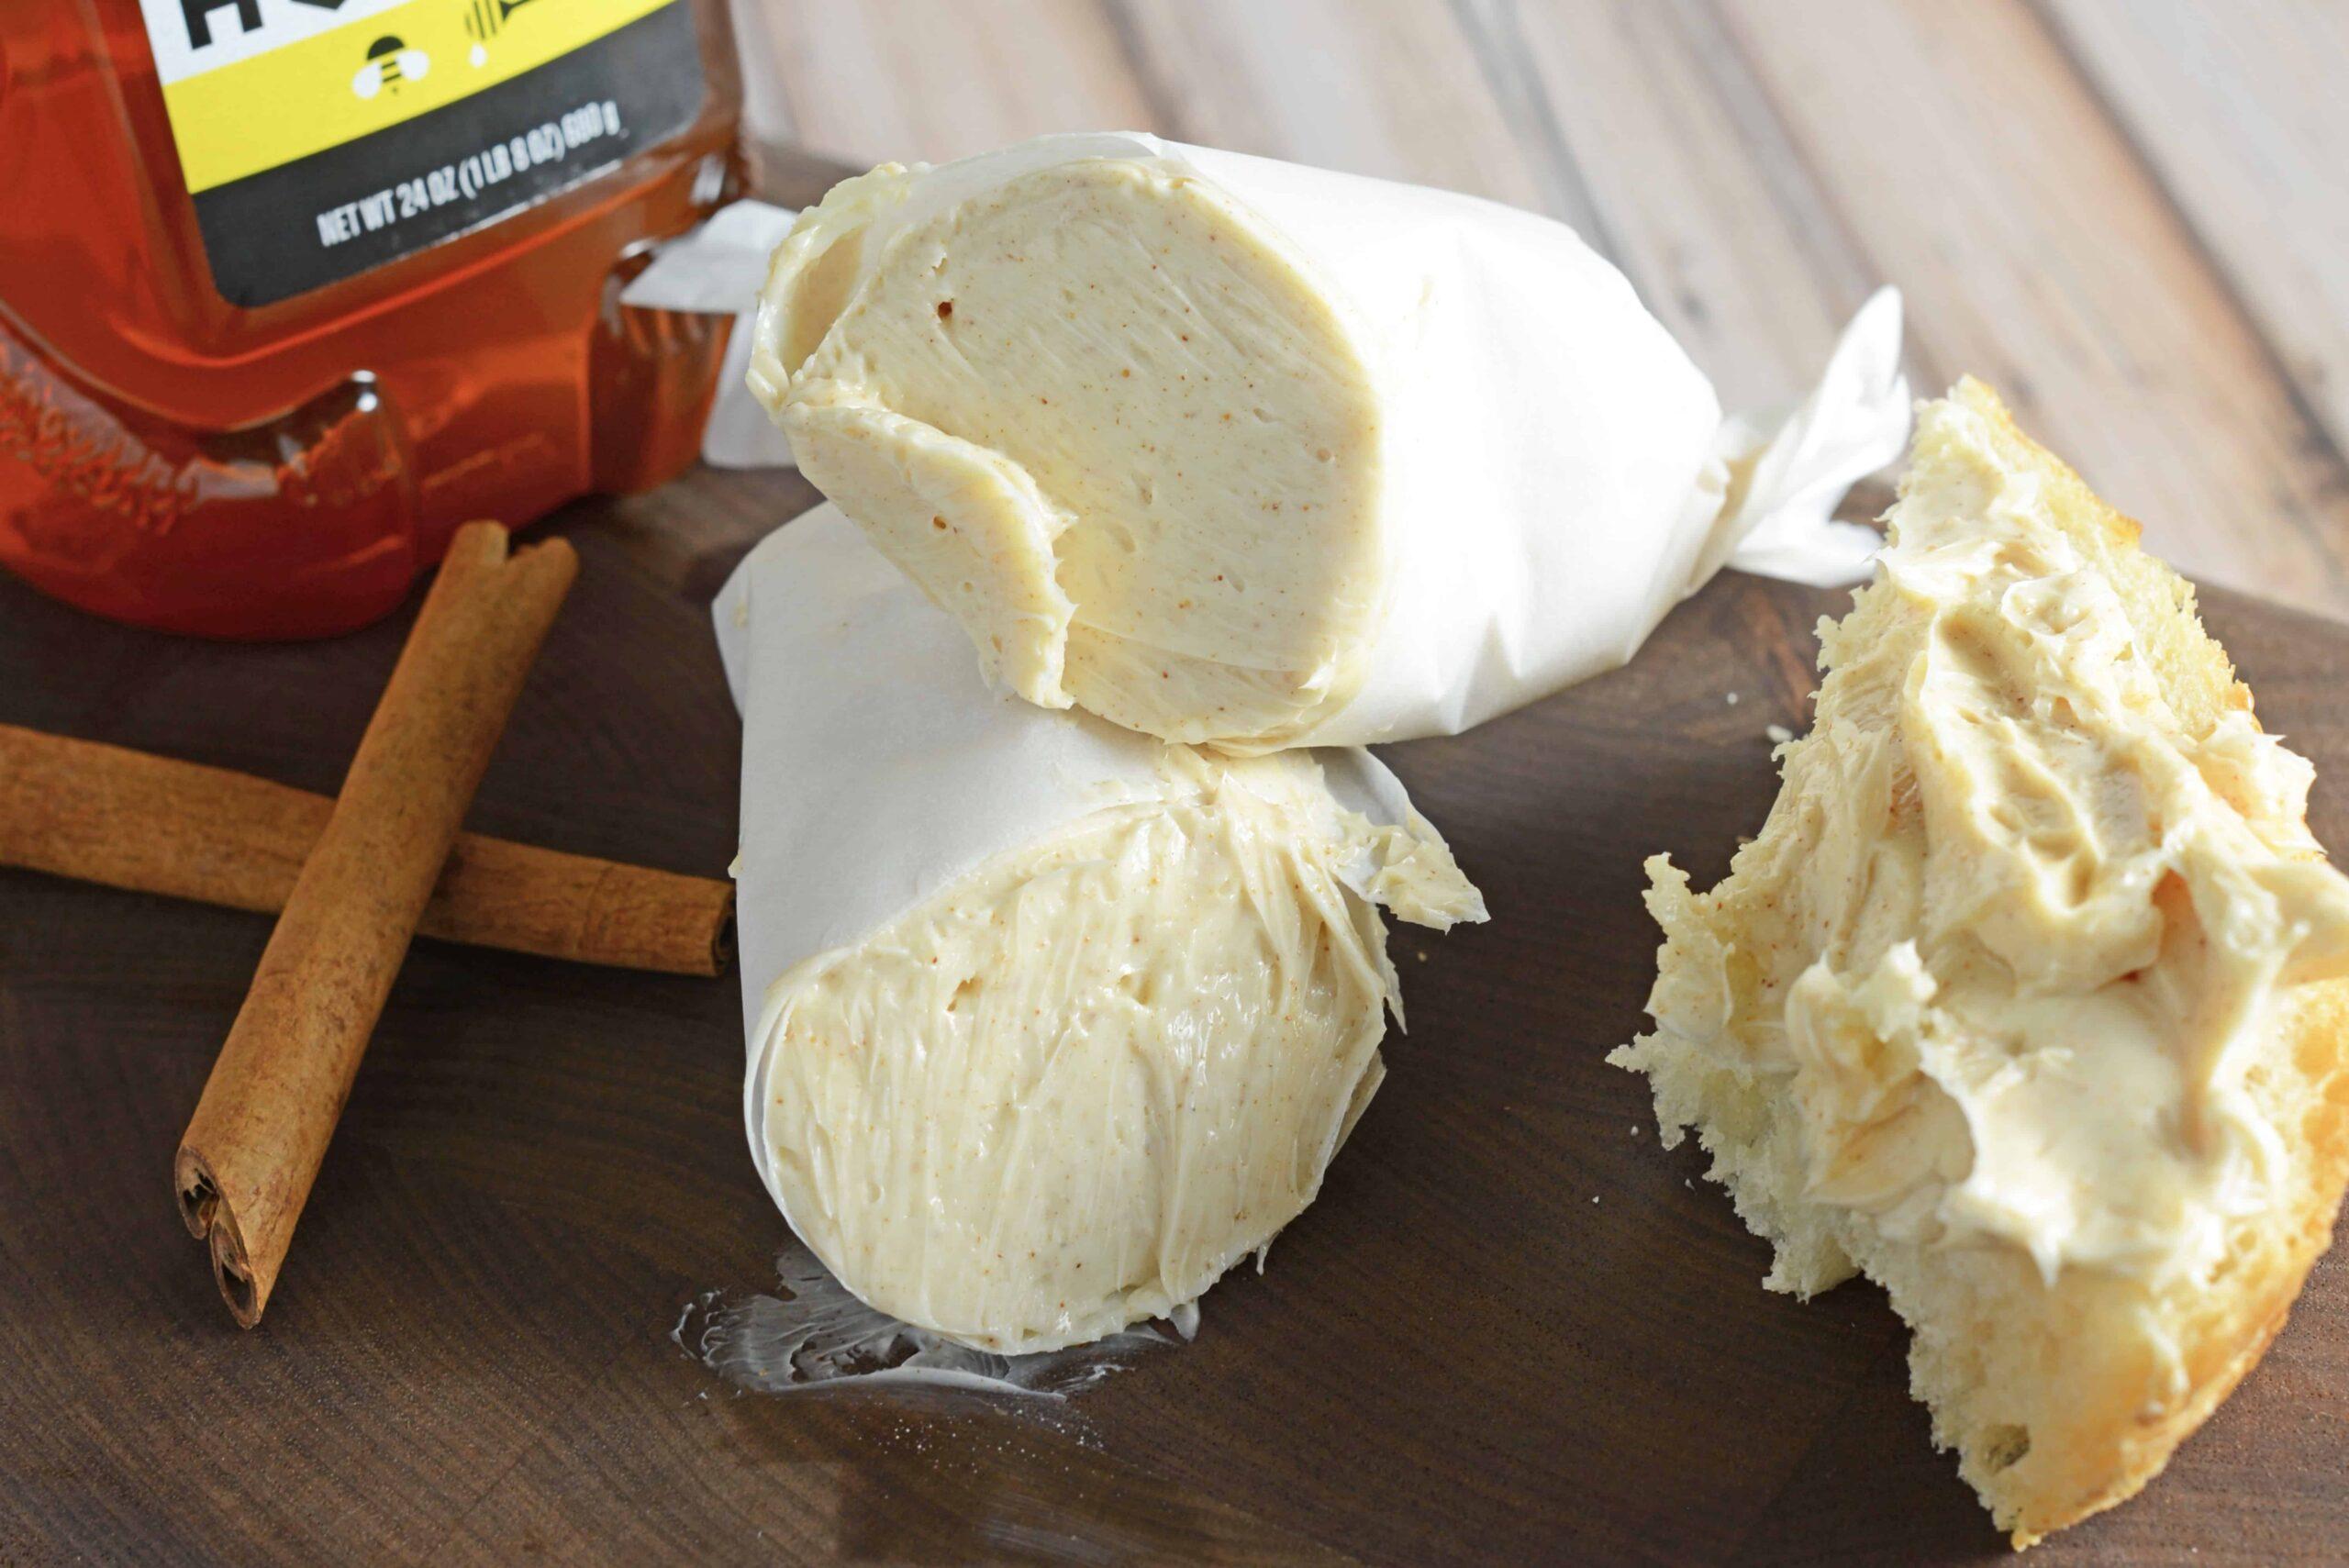 Roll of Copycat Texas Roadhouse Butter cut in half